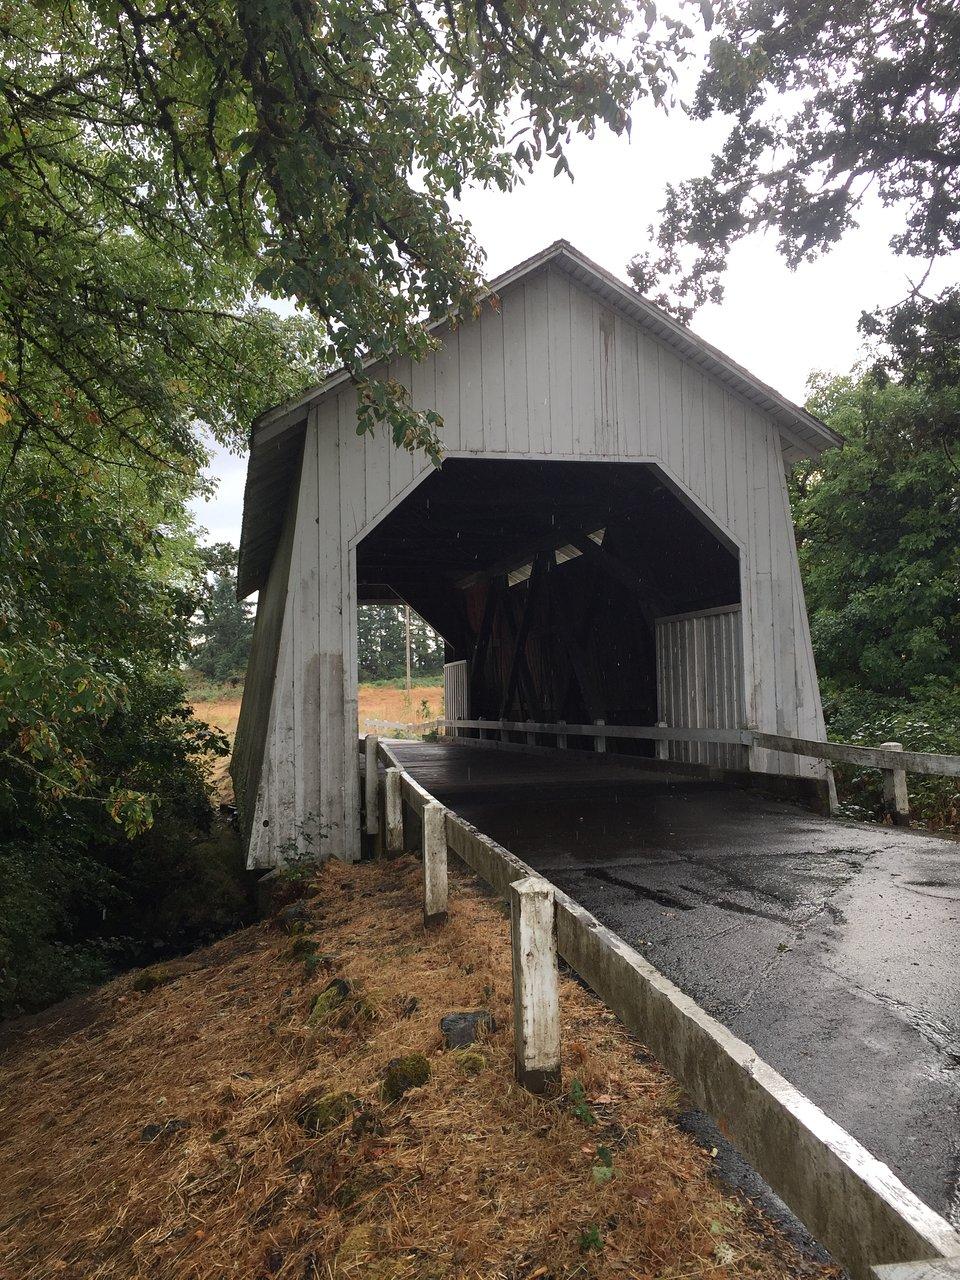 irish bend covered bridge corvallis 2019 all you need to know rh tripadvisor co uk